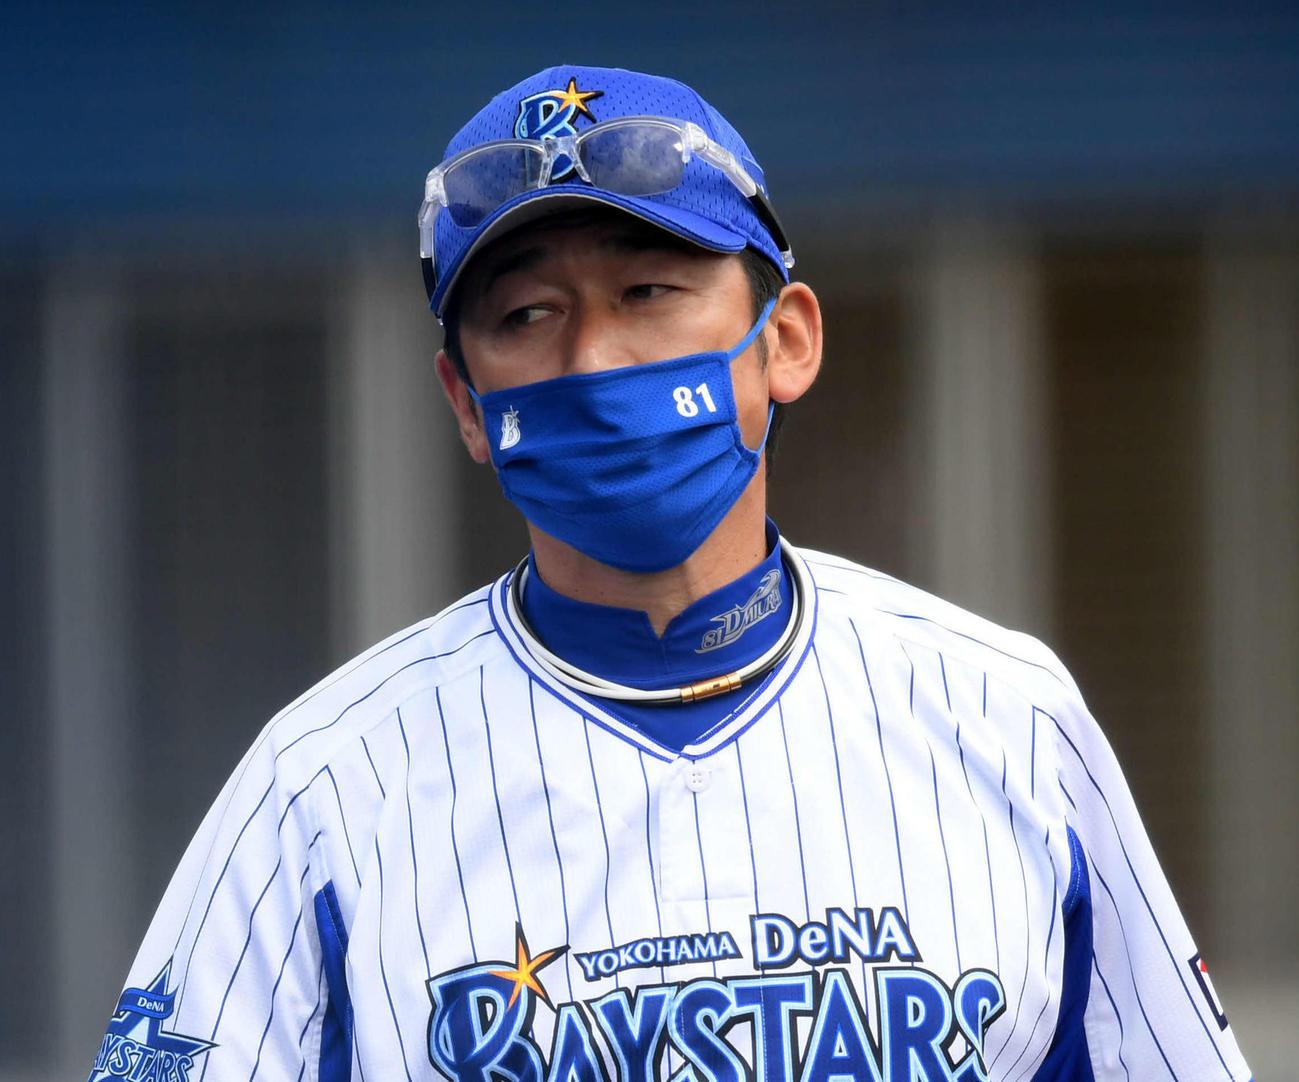 DeNA対楽天 選手交代を告げるDeNA三浦監督(撮影・横山健太)